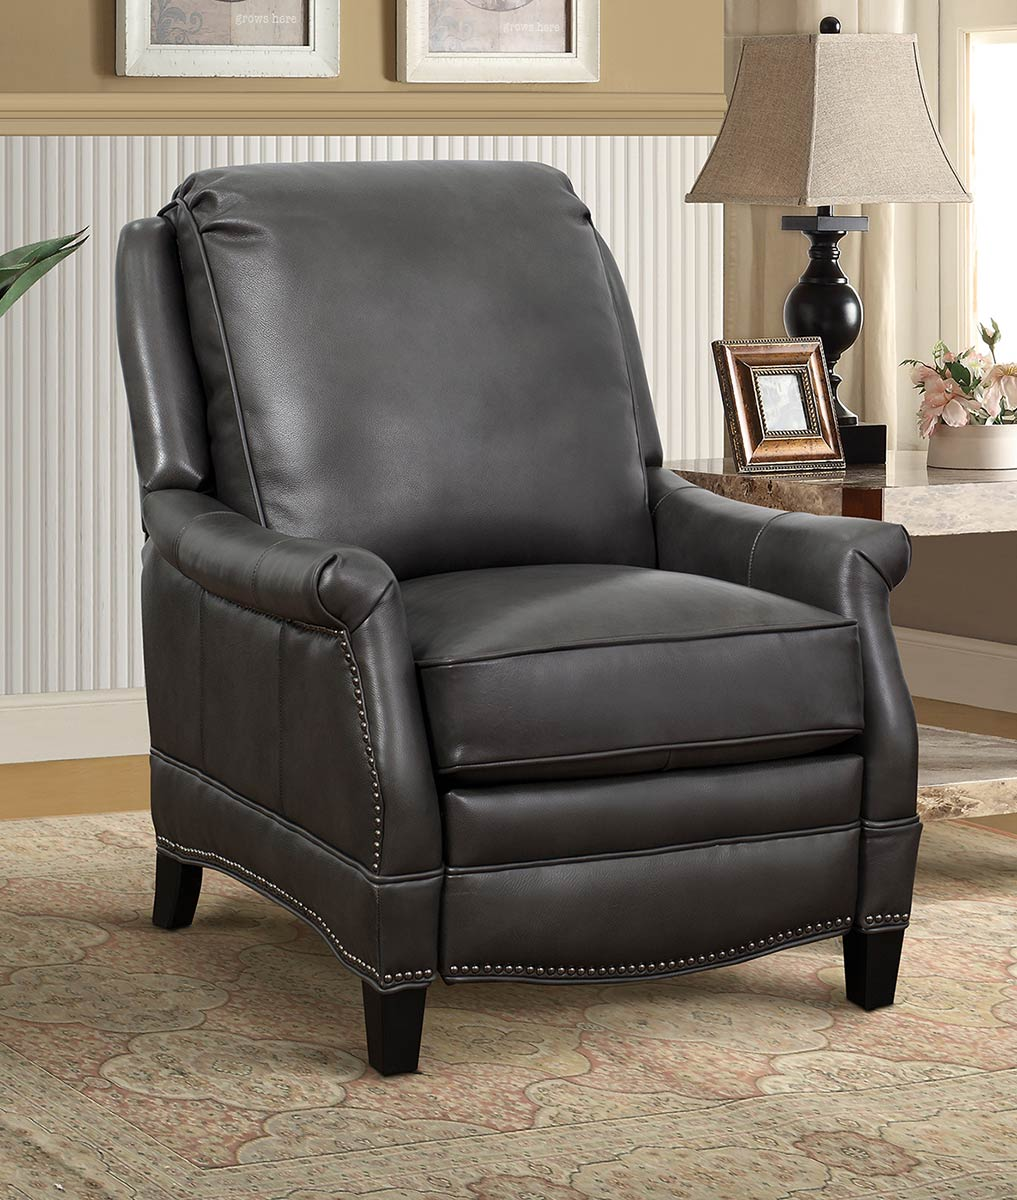 Barcalounger Ashebrooke Recliner Chair - Wrenn Gray/All Leather